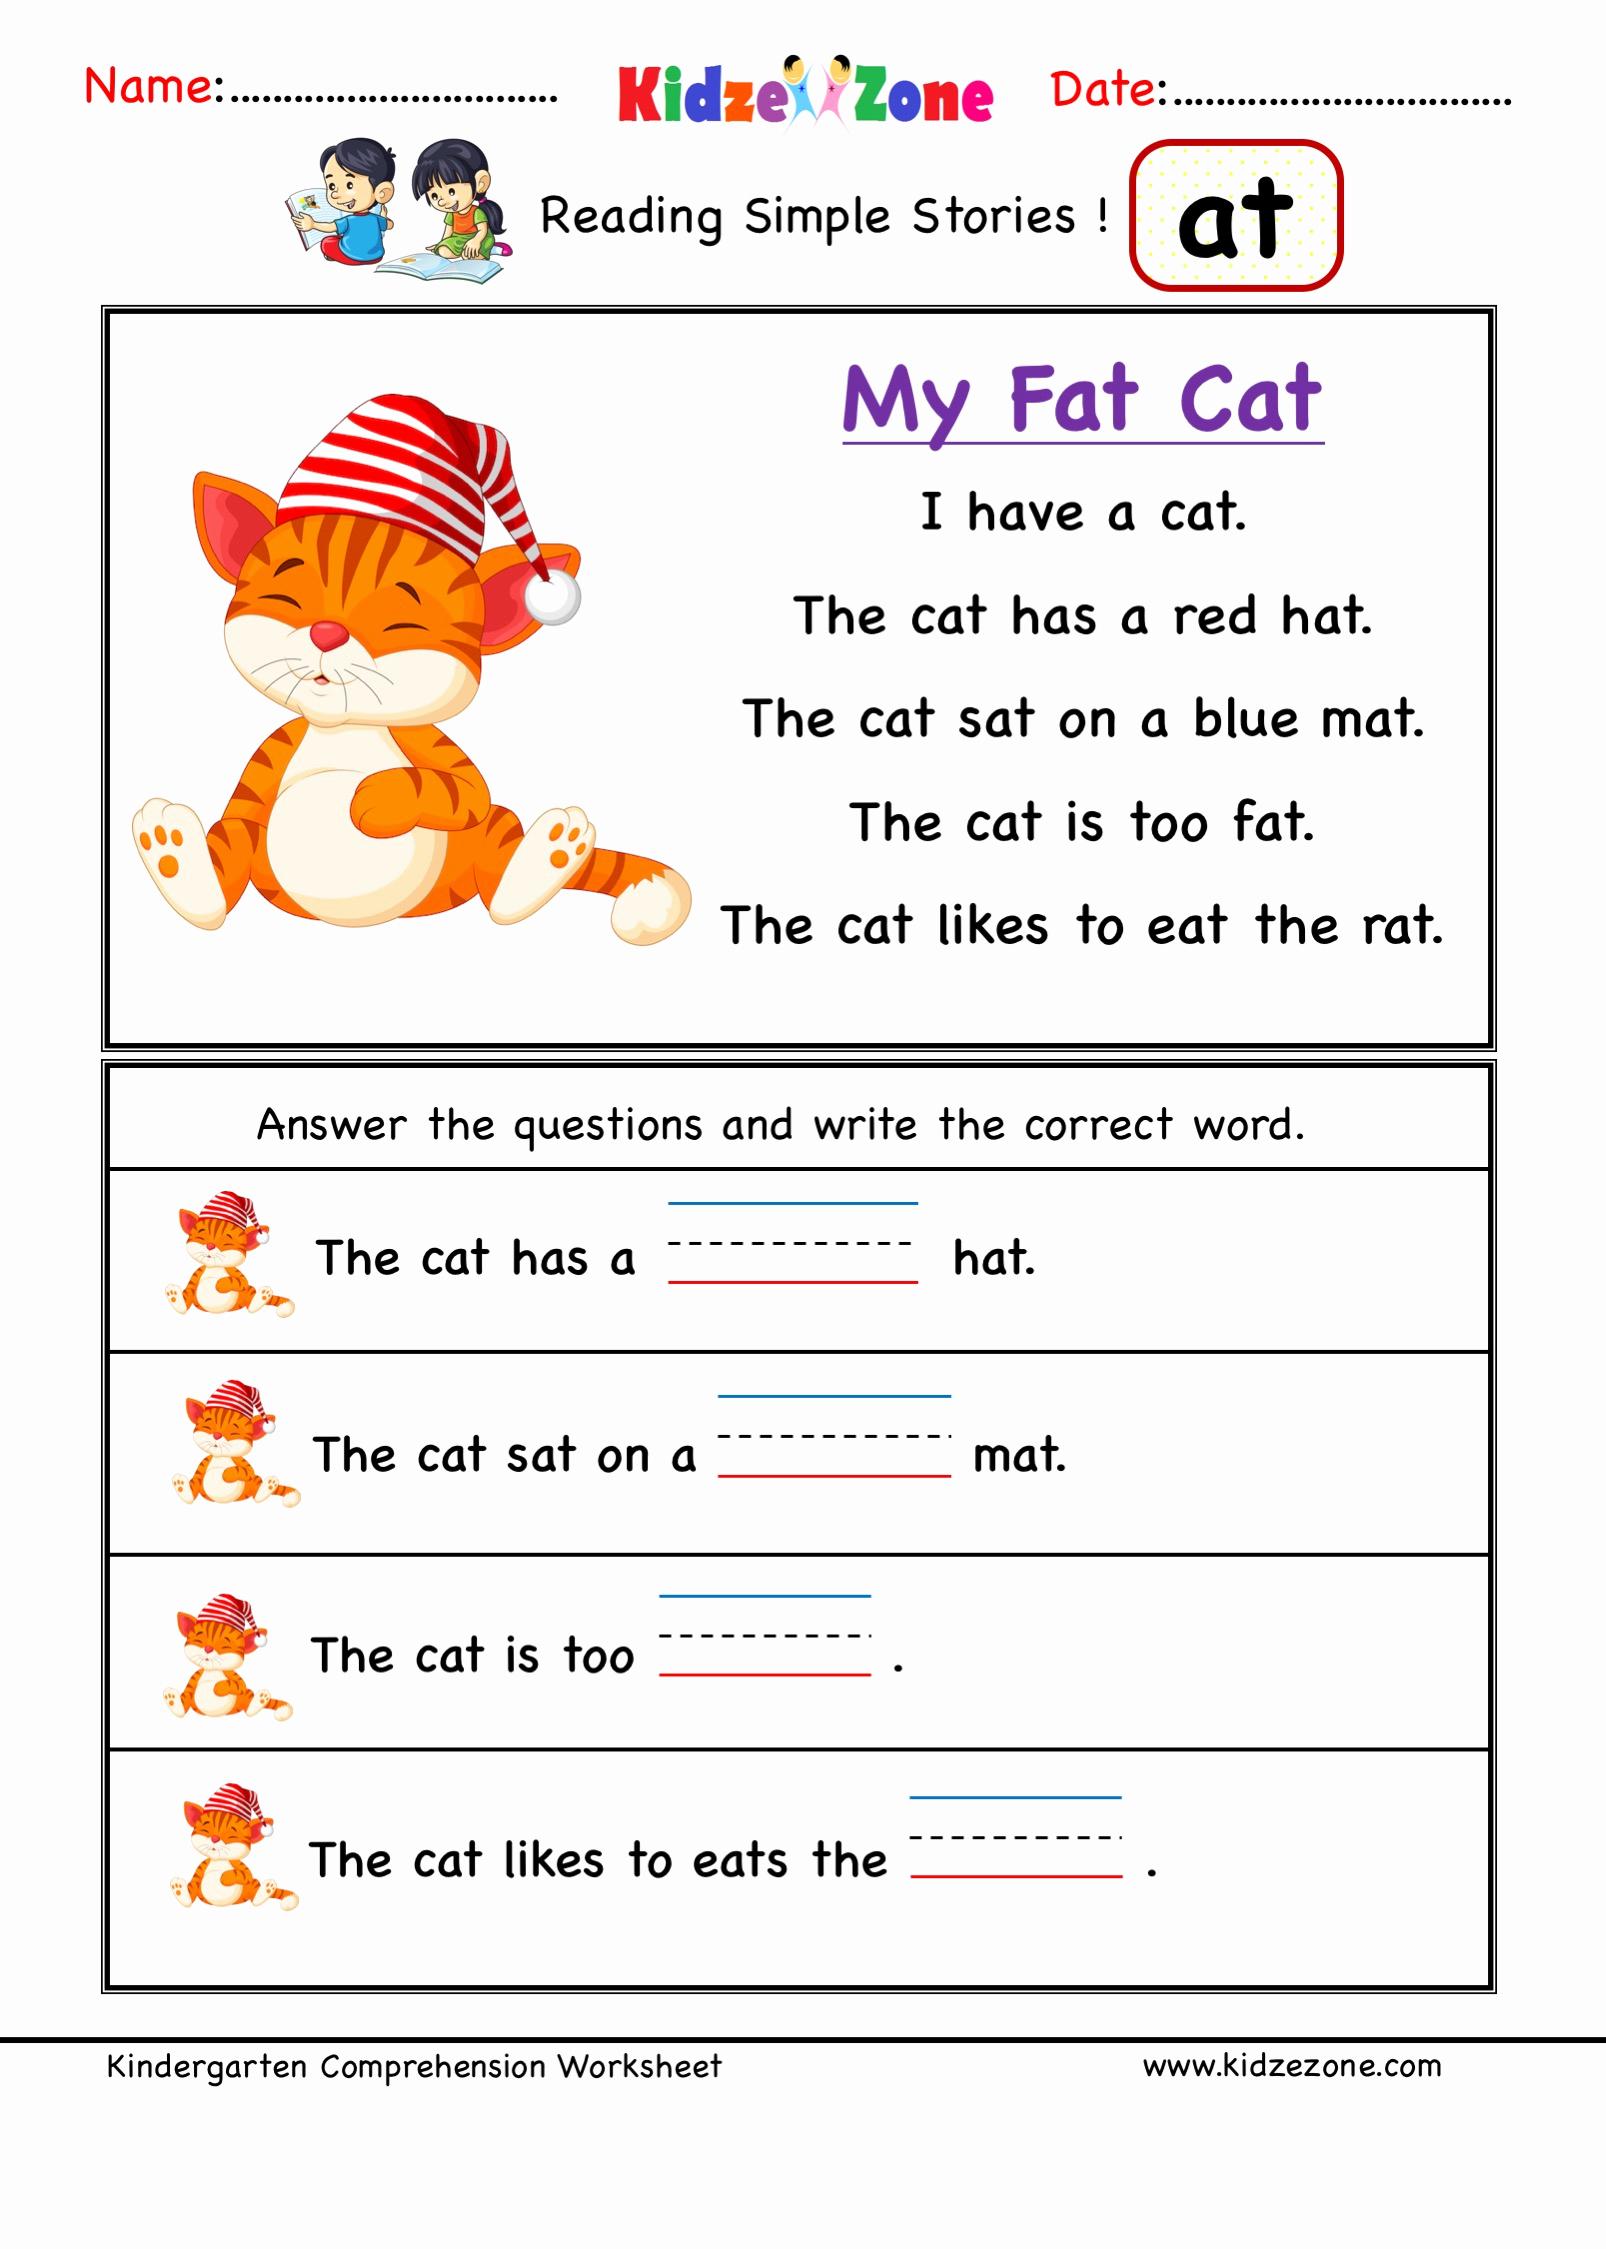 Word Family Worksheet Kindergarten Inspirational Kindergarten Worksheets at Word Family Reading